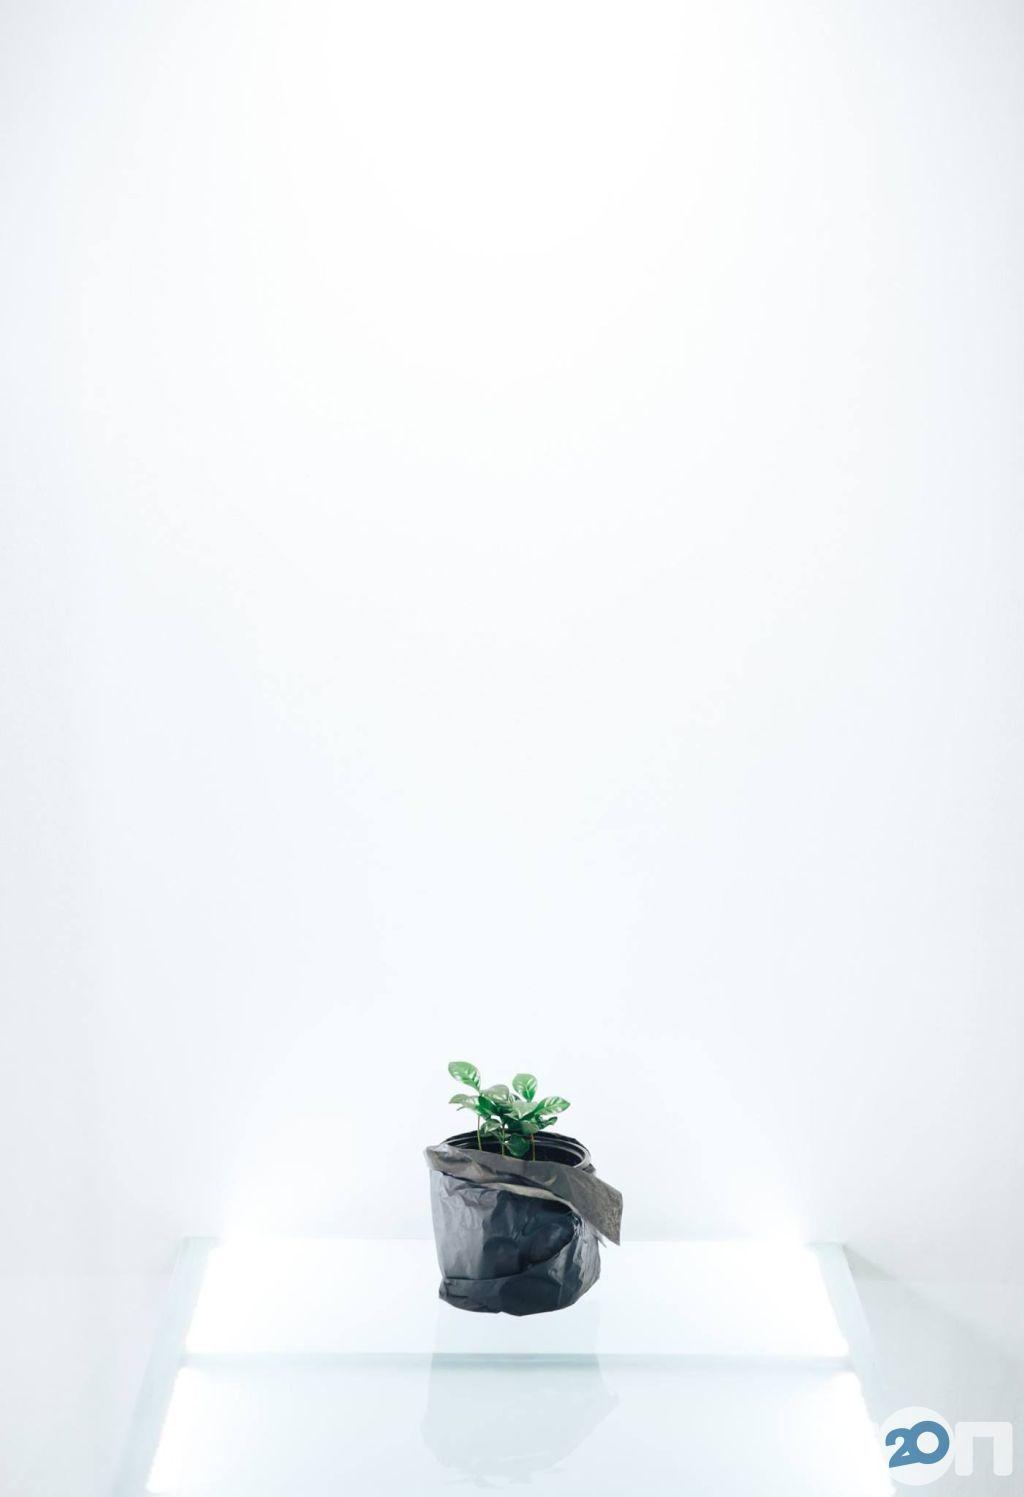 СКОВОРОДКА, кофейня - фото 4